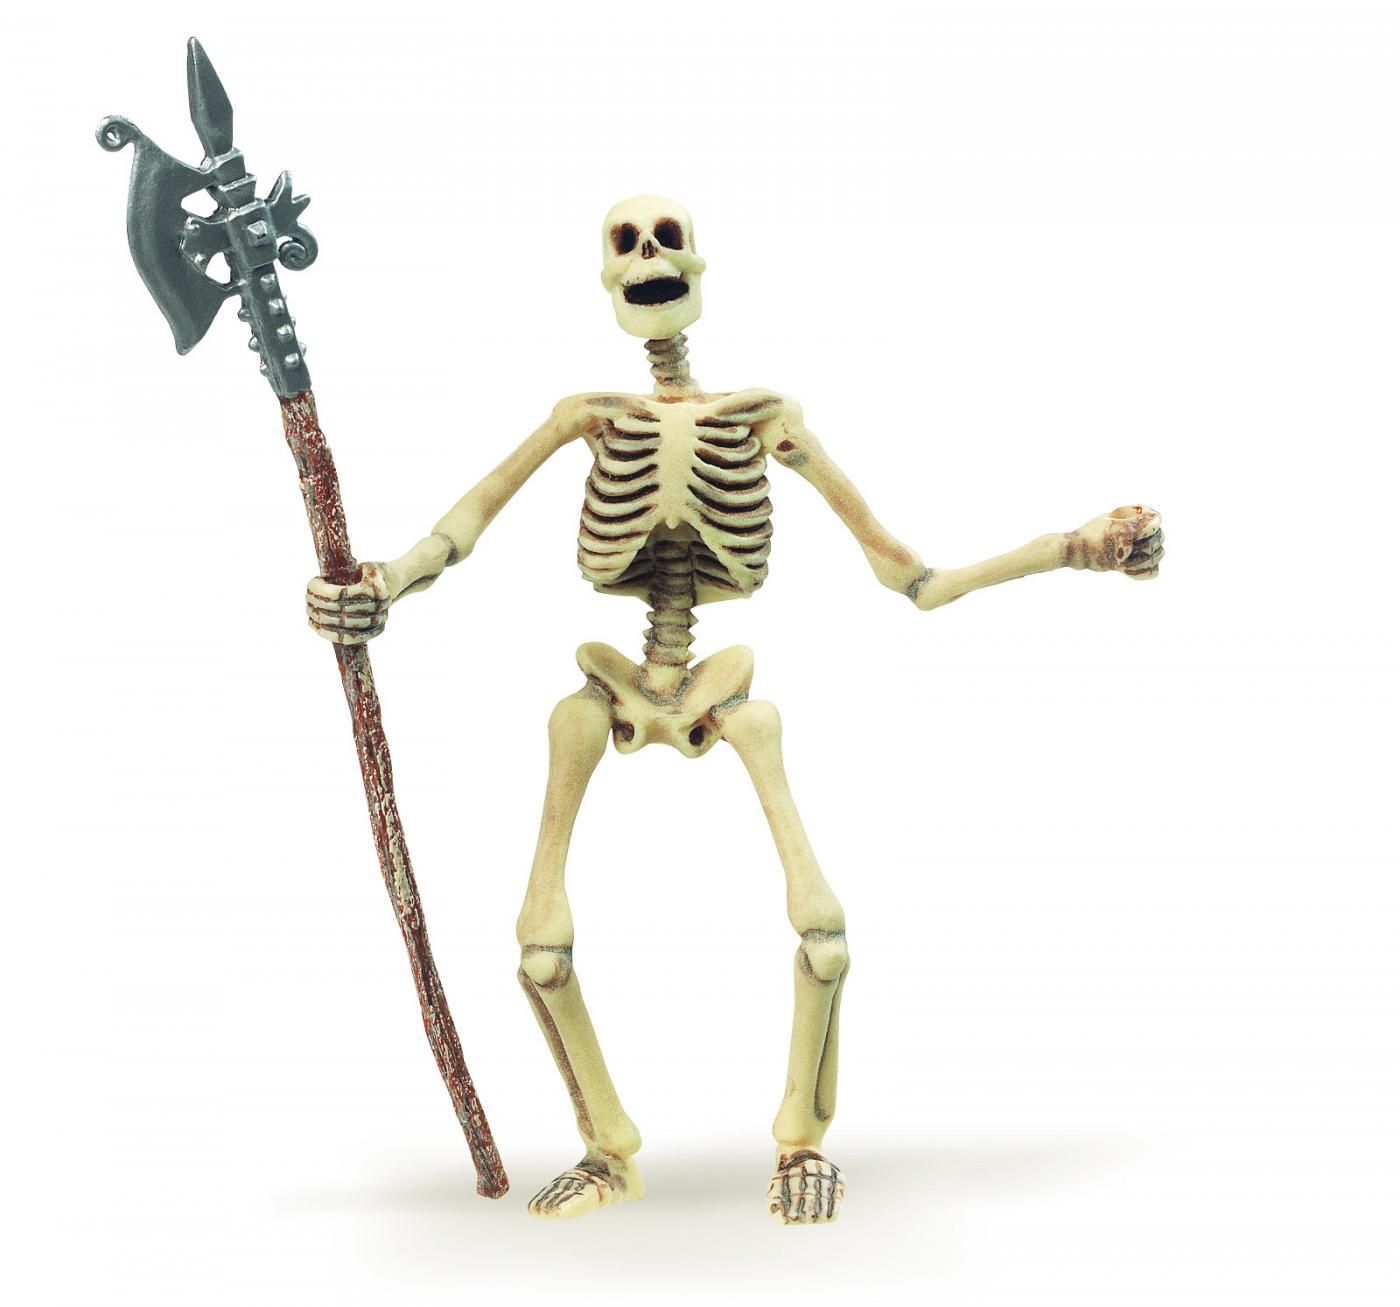 Papo 38993 Skelett Pferd - Drachen & Elfen - Figuren bei spielzeug ...